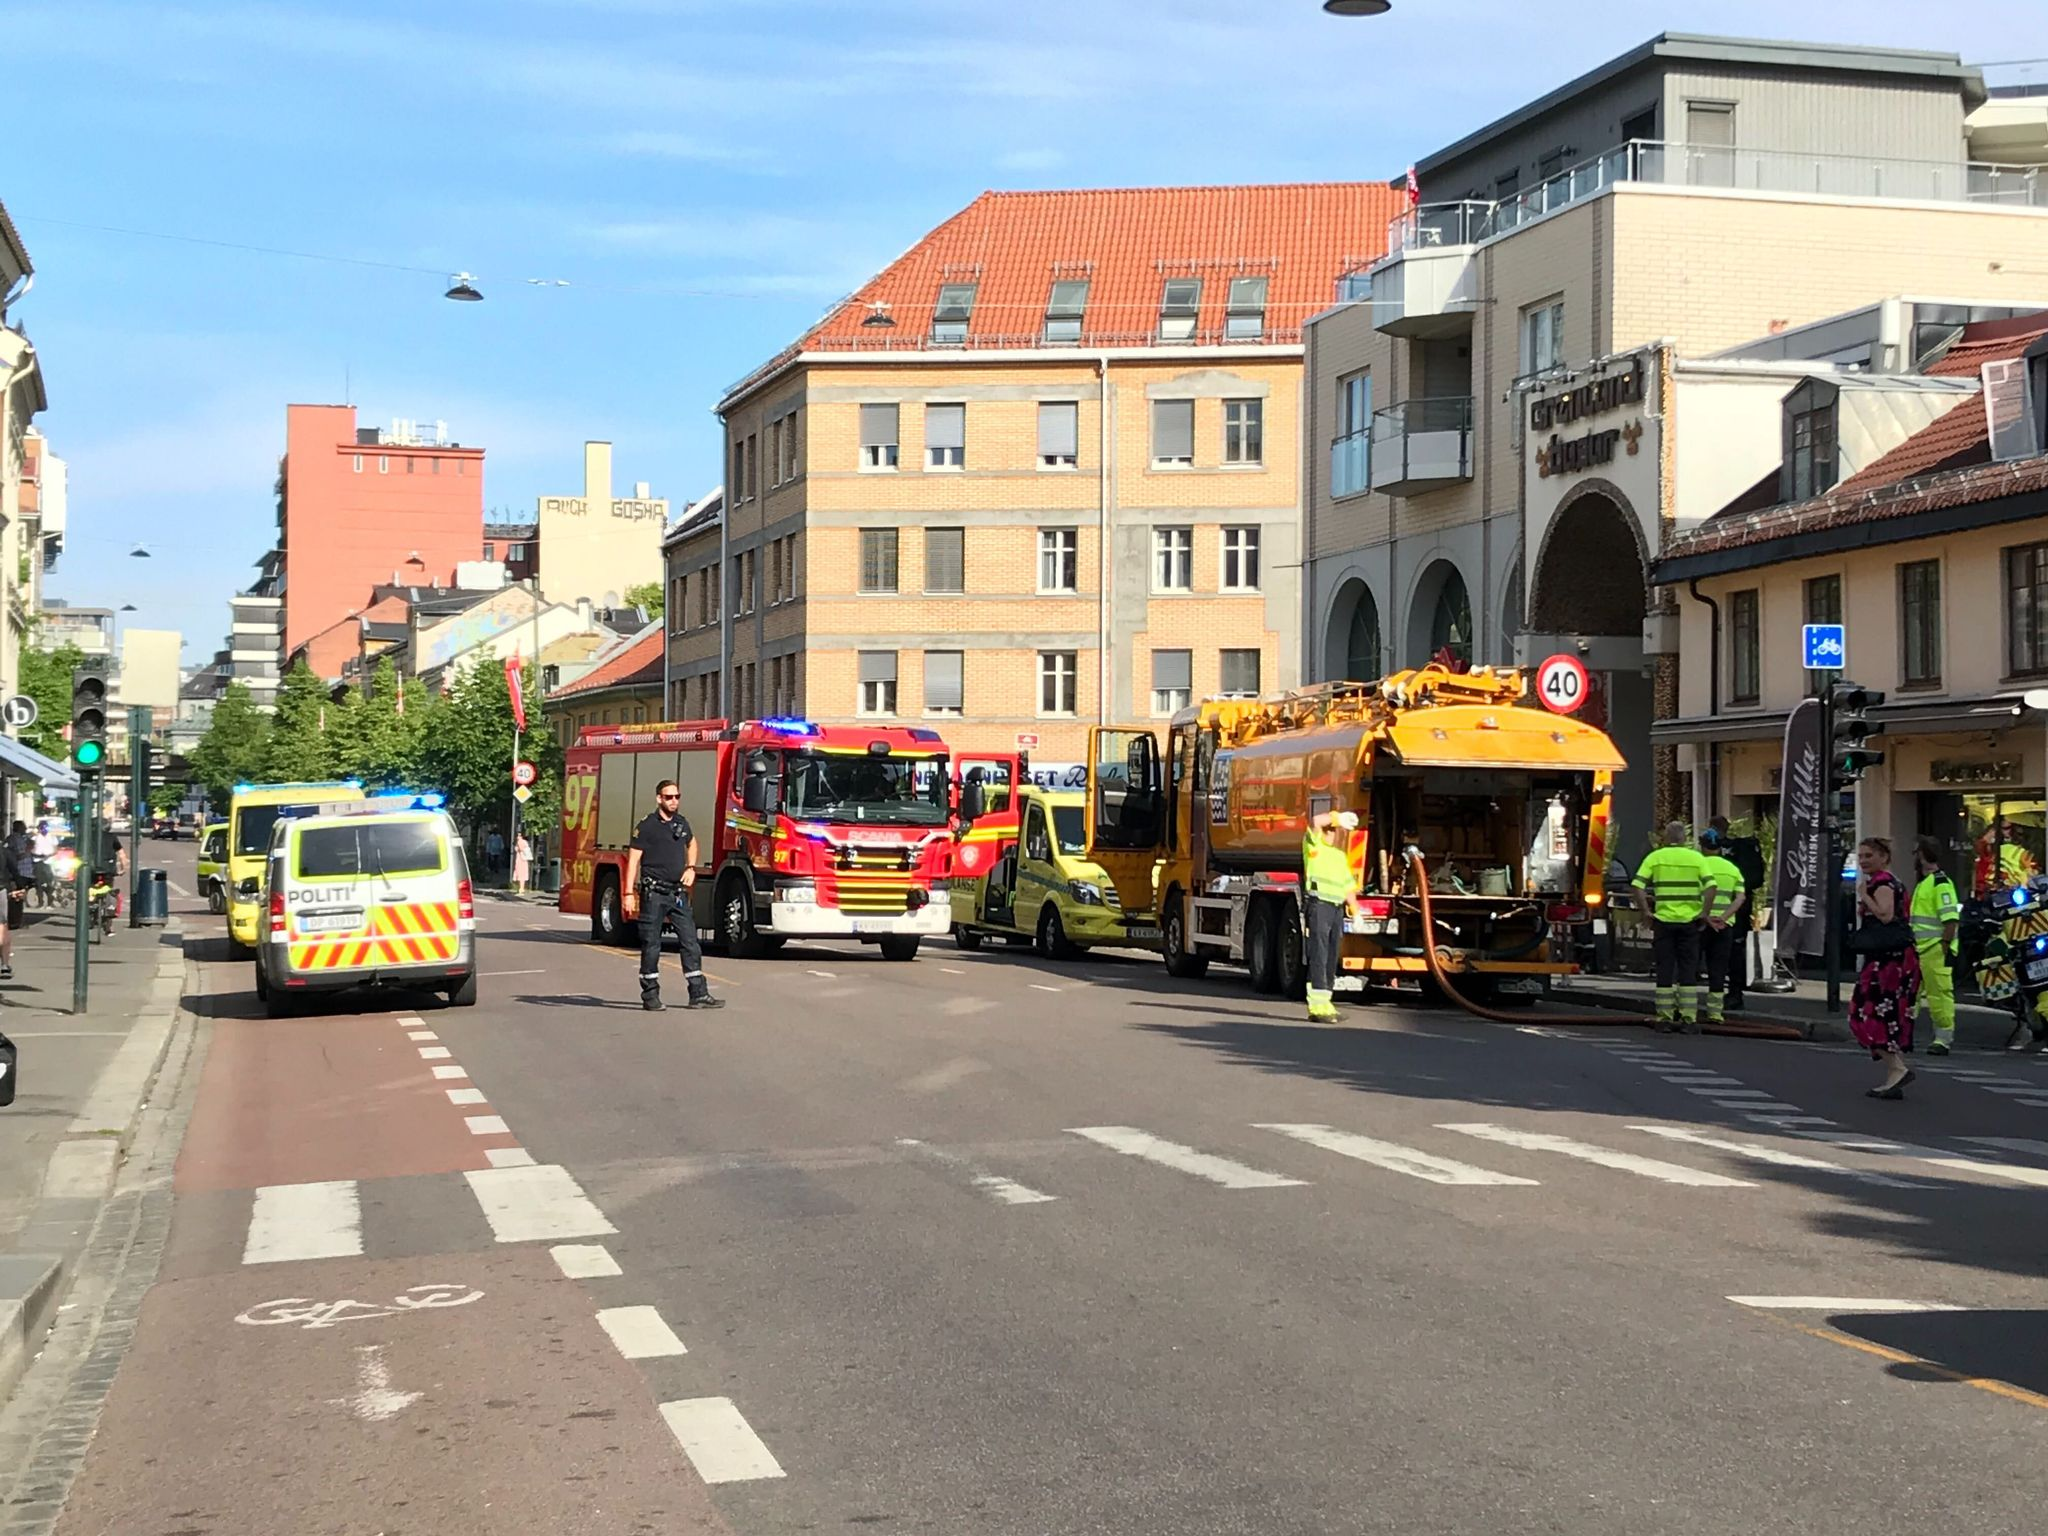 Syklist alvorlig skadet i ulykke på Grønland i Oslo